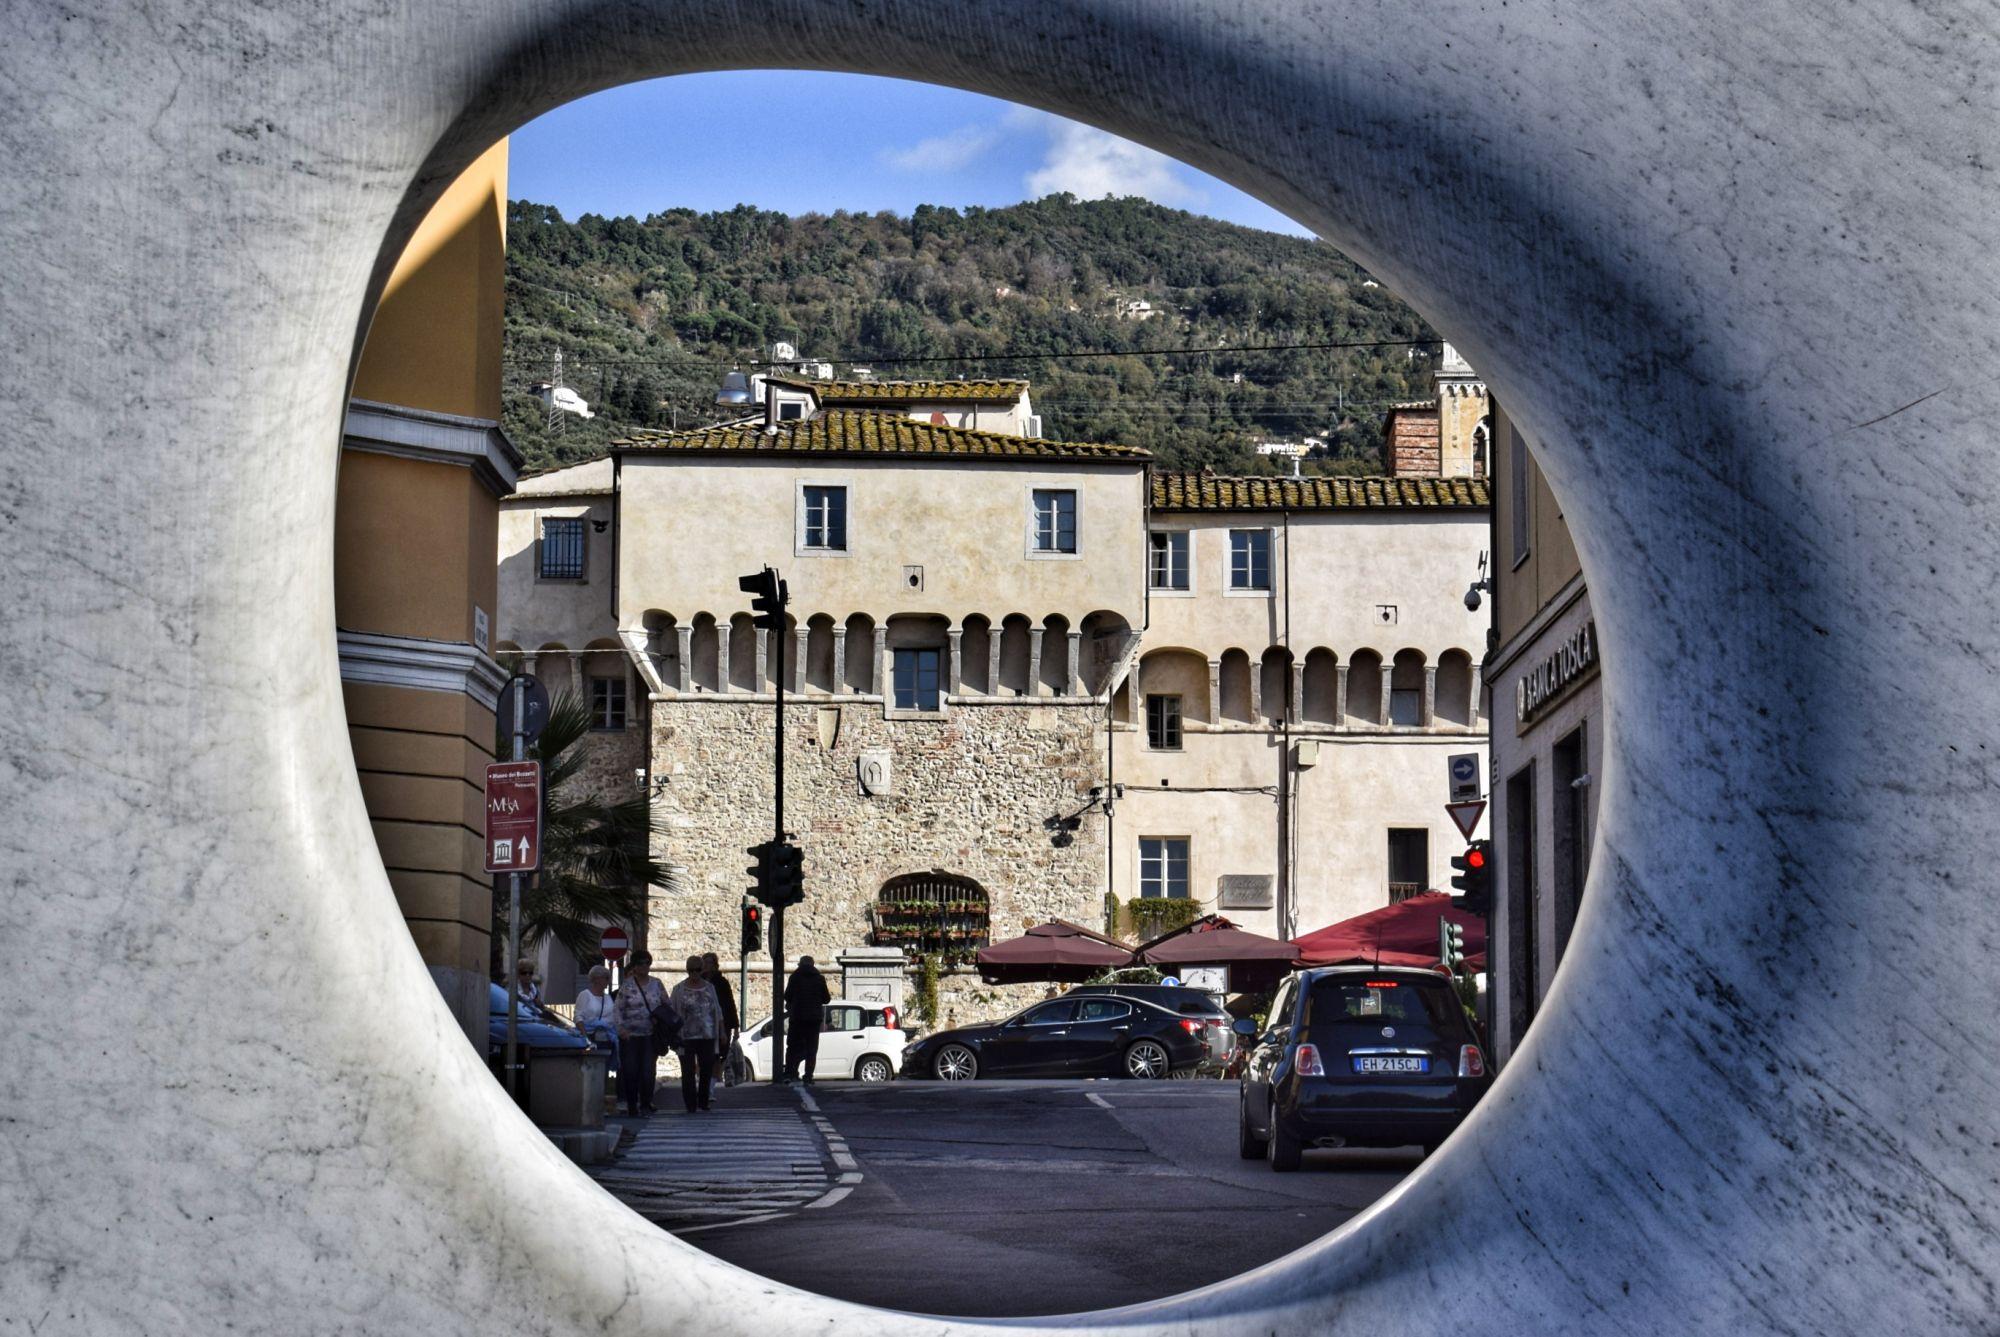 Gallerie d'arte, Pietrasanta città record